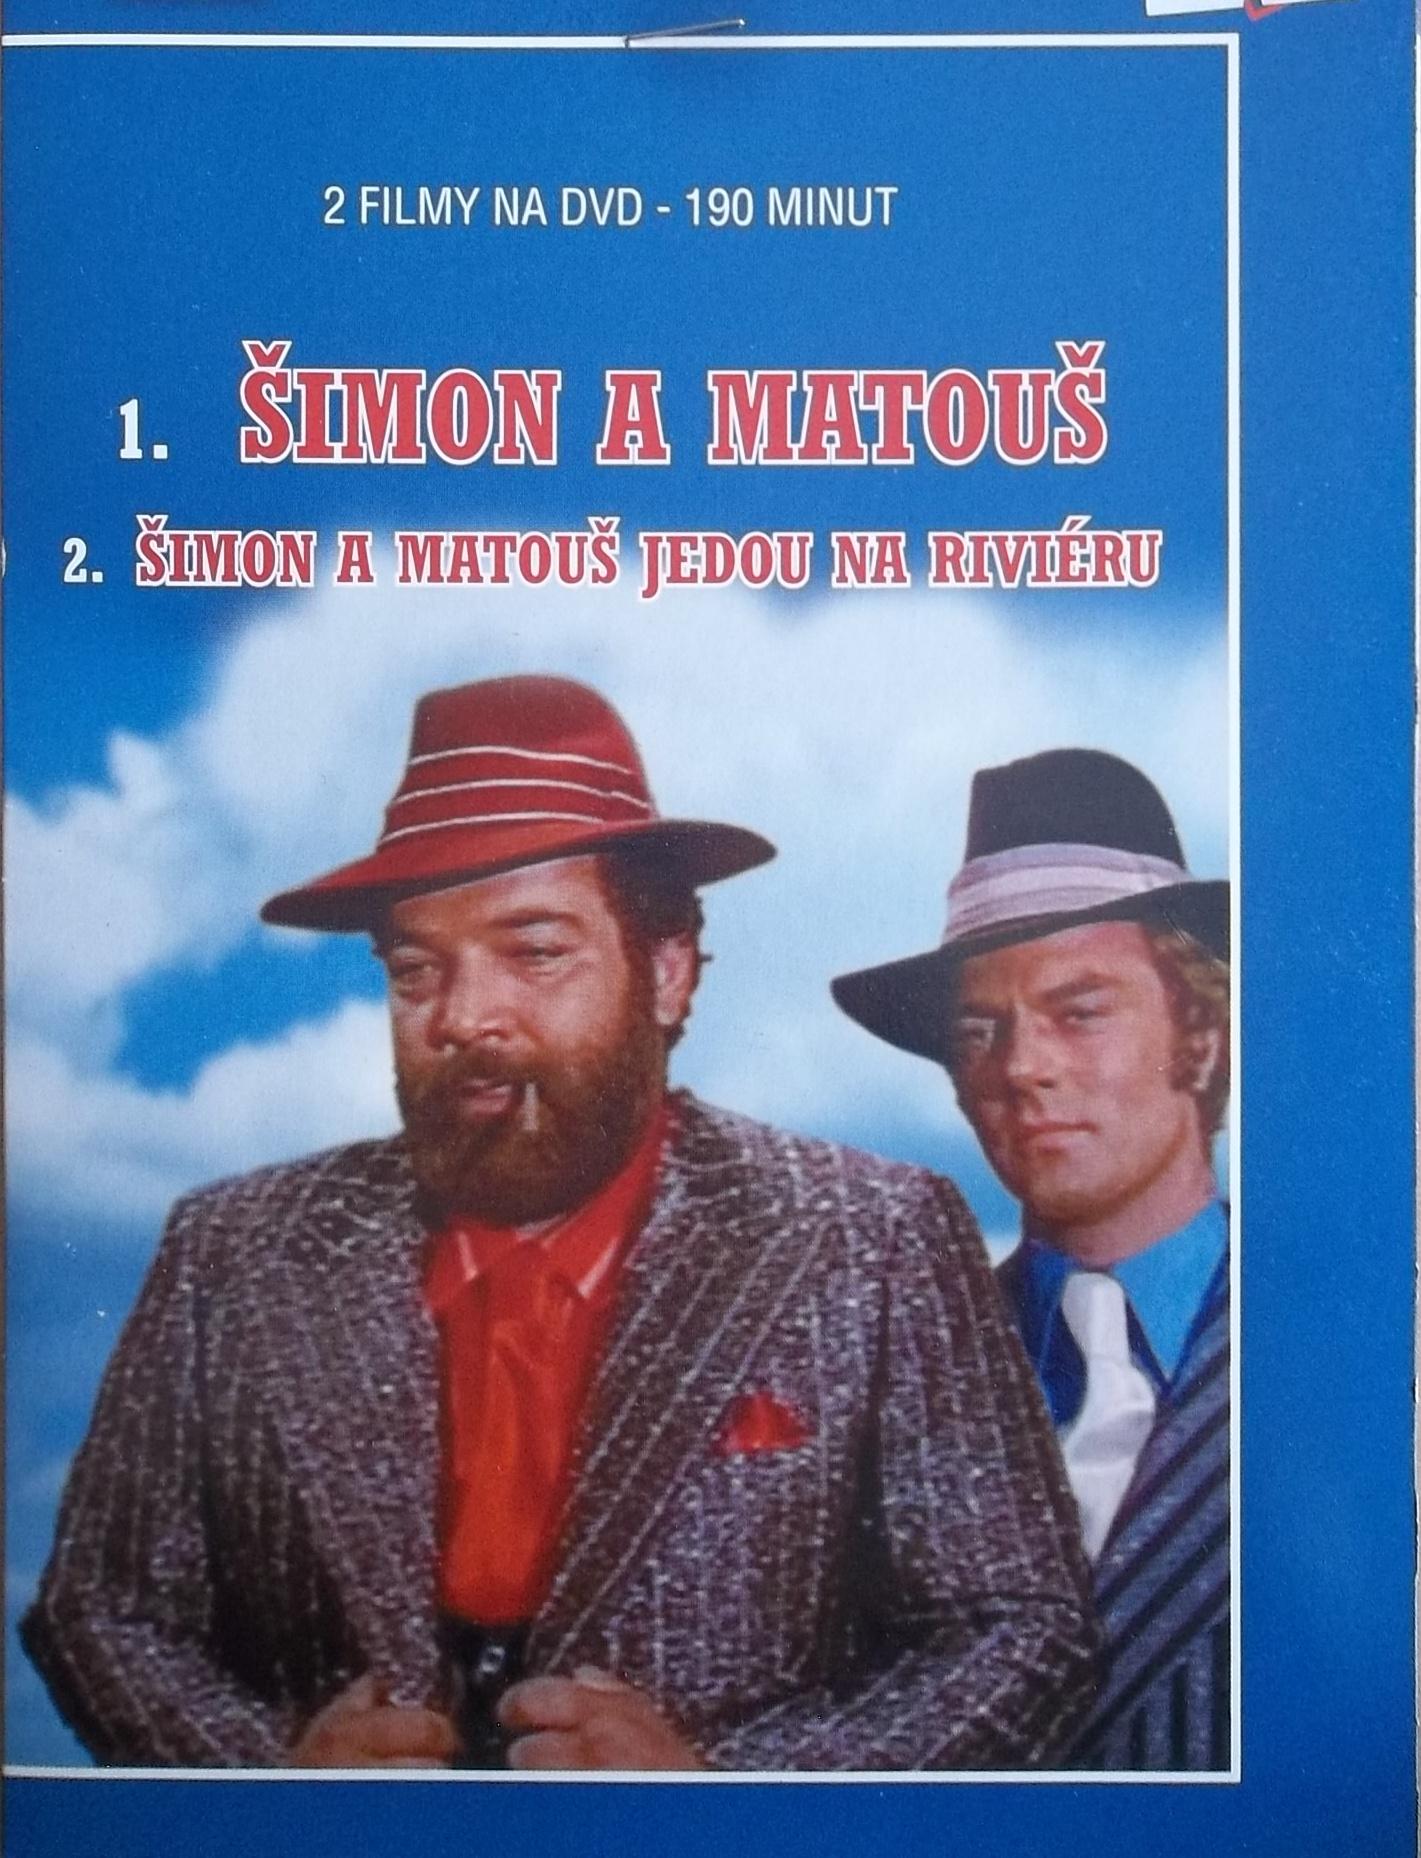 2filmy Šimon a Matouš/Šimon a Matouš jedou na riviéru